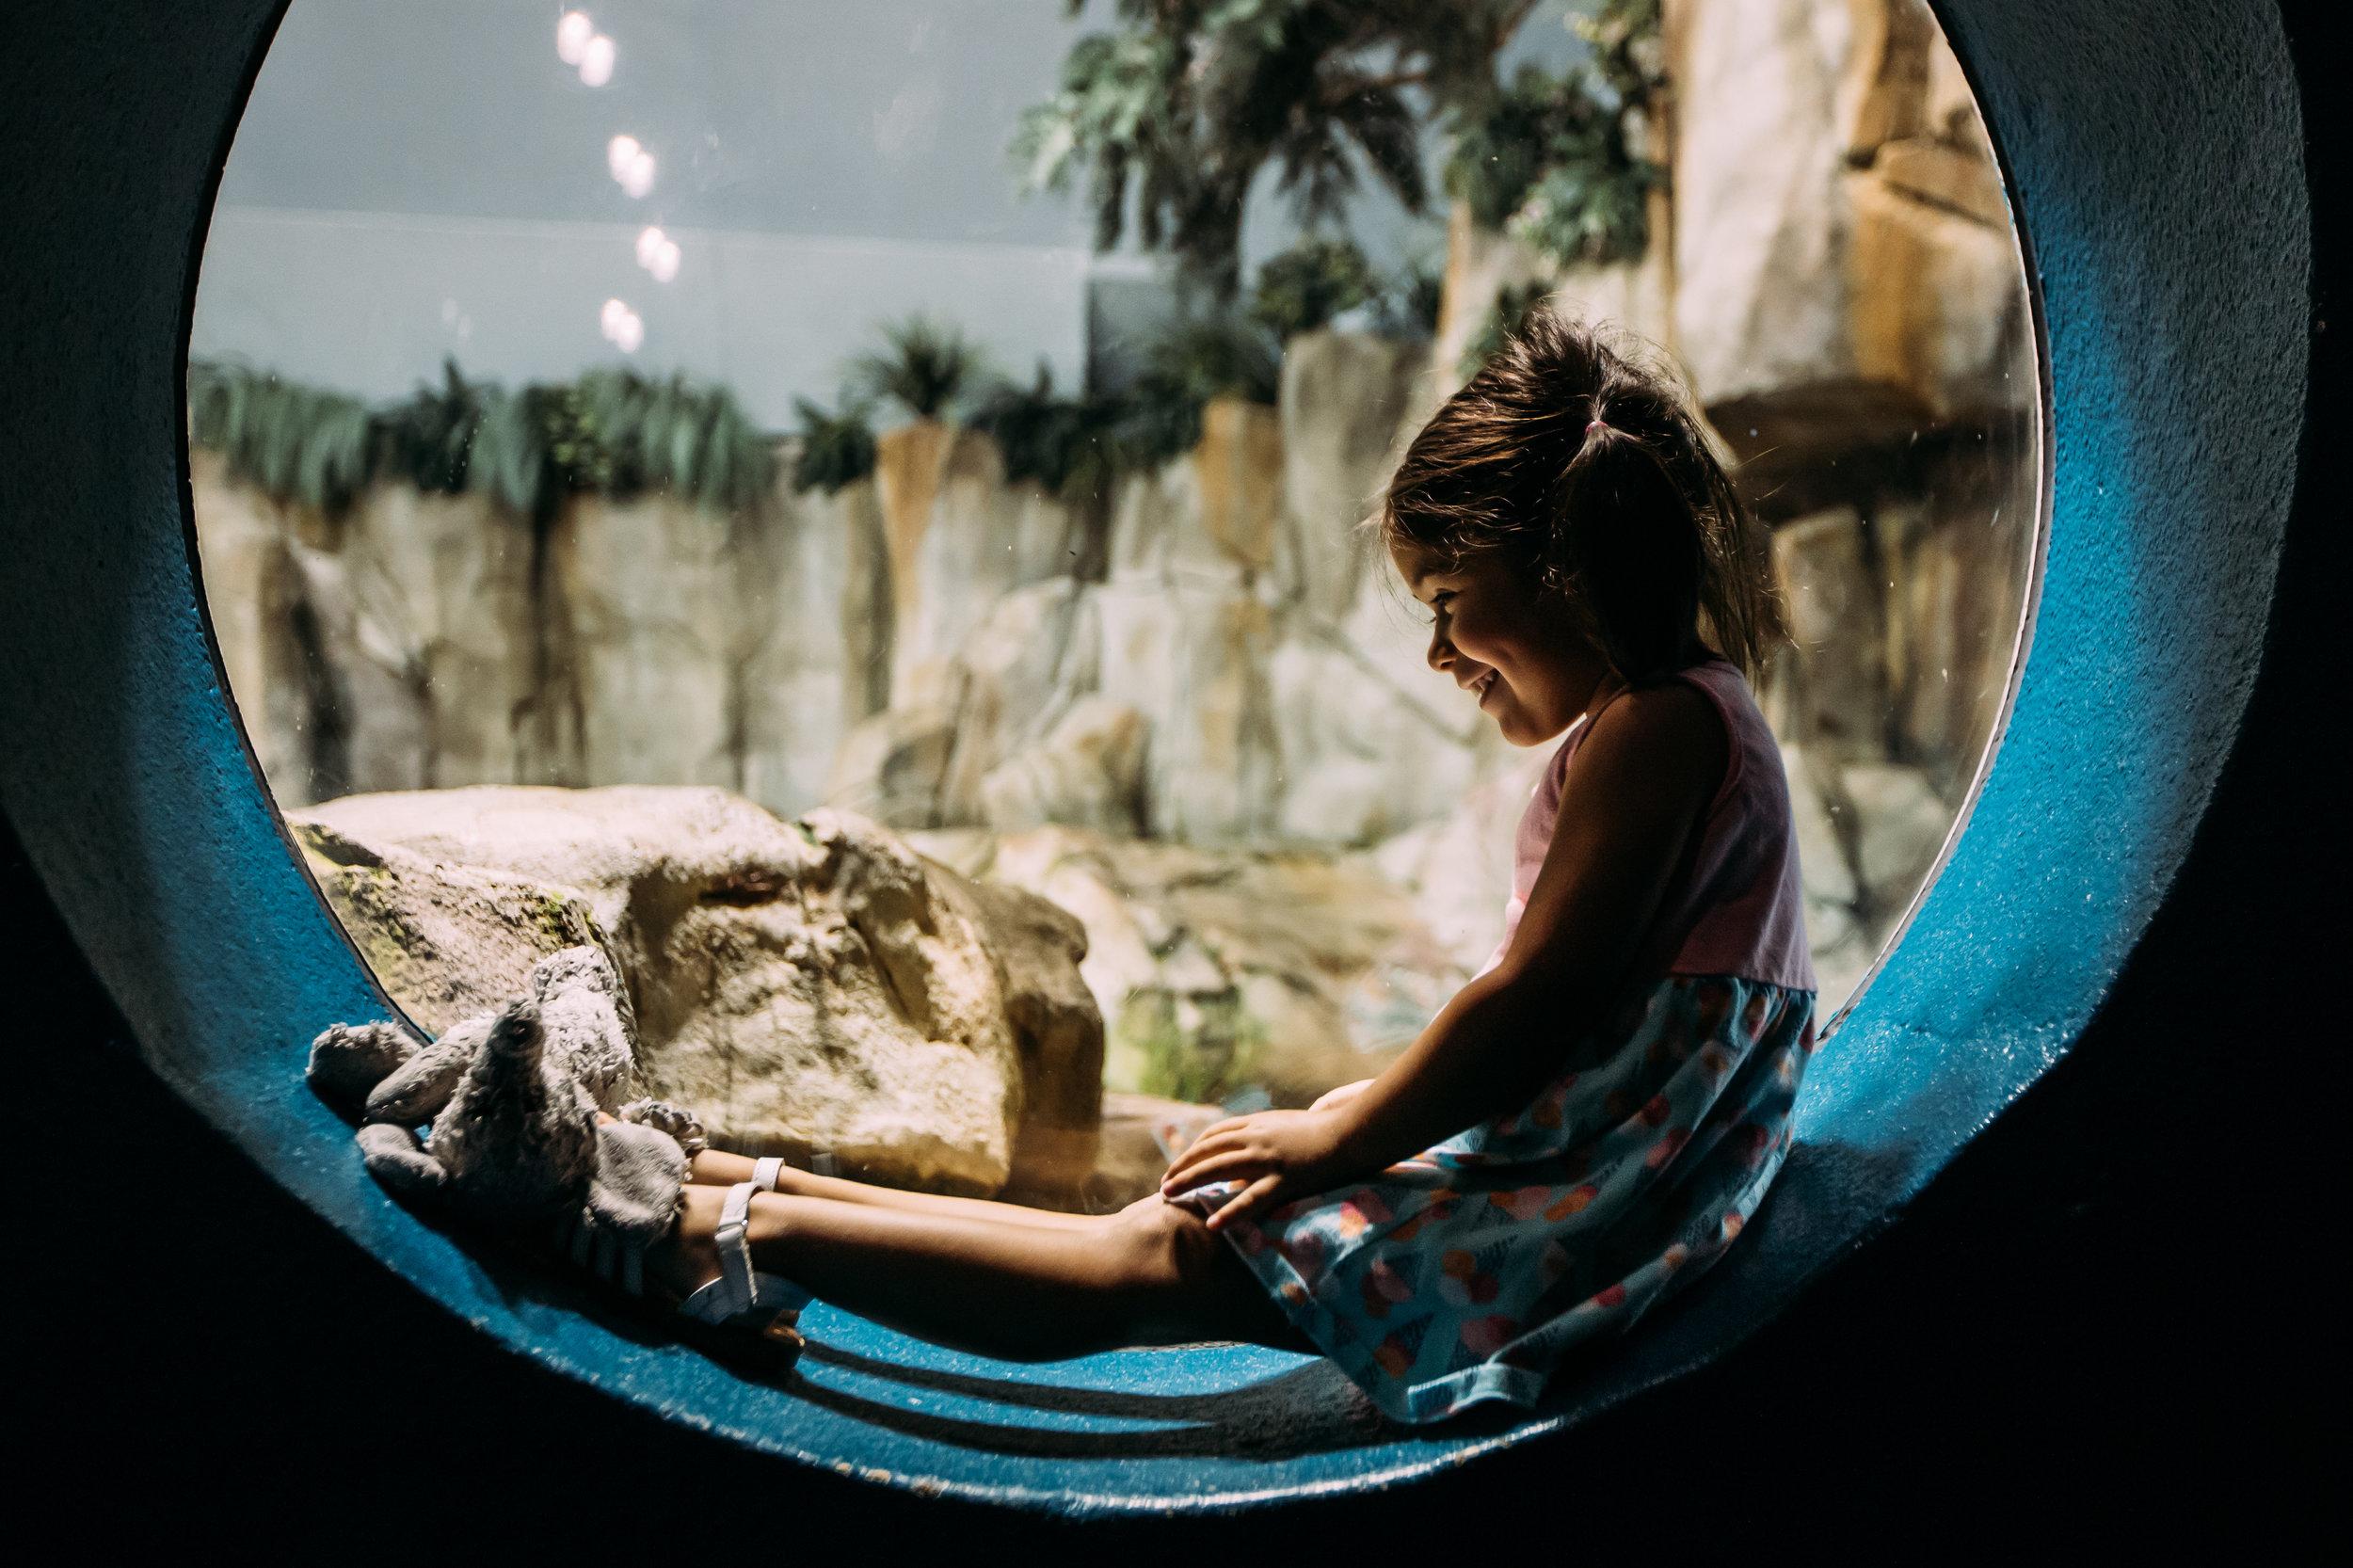 Little girl in circlular window